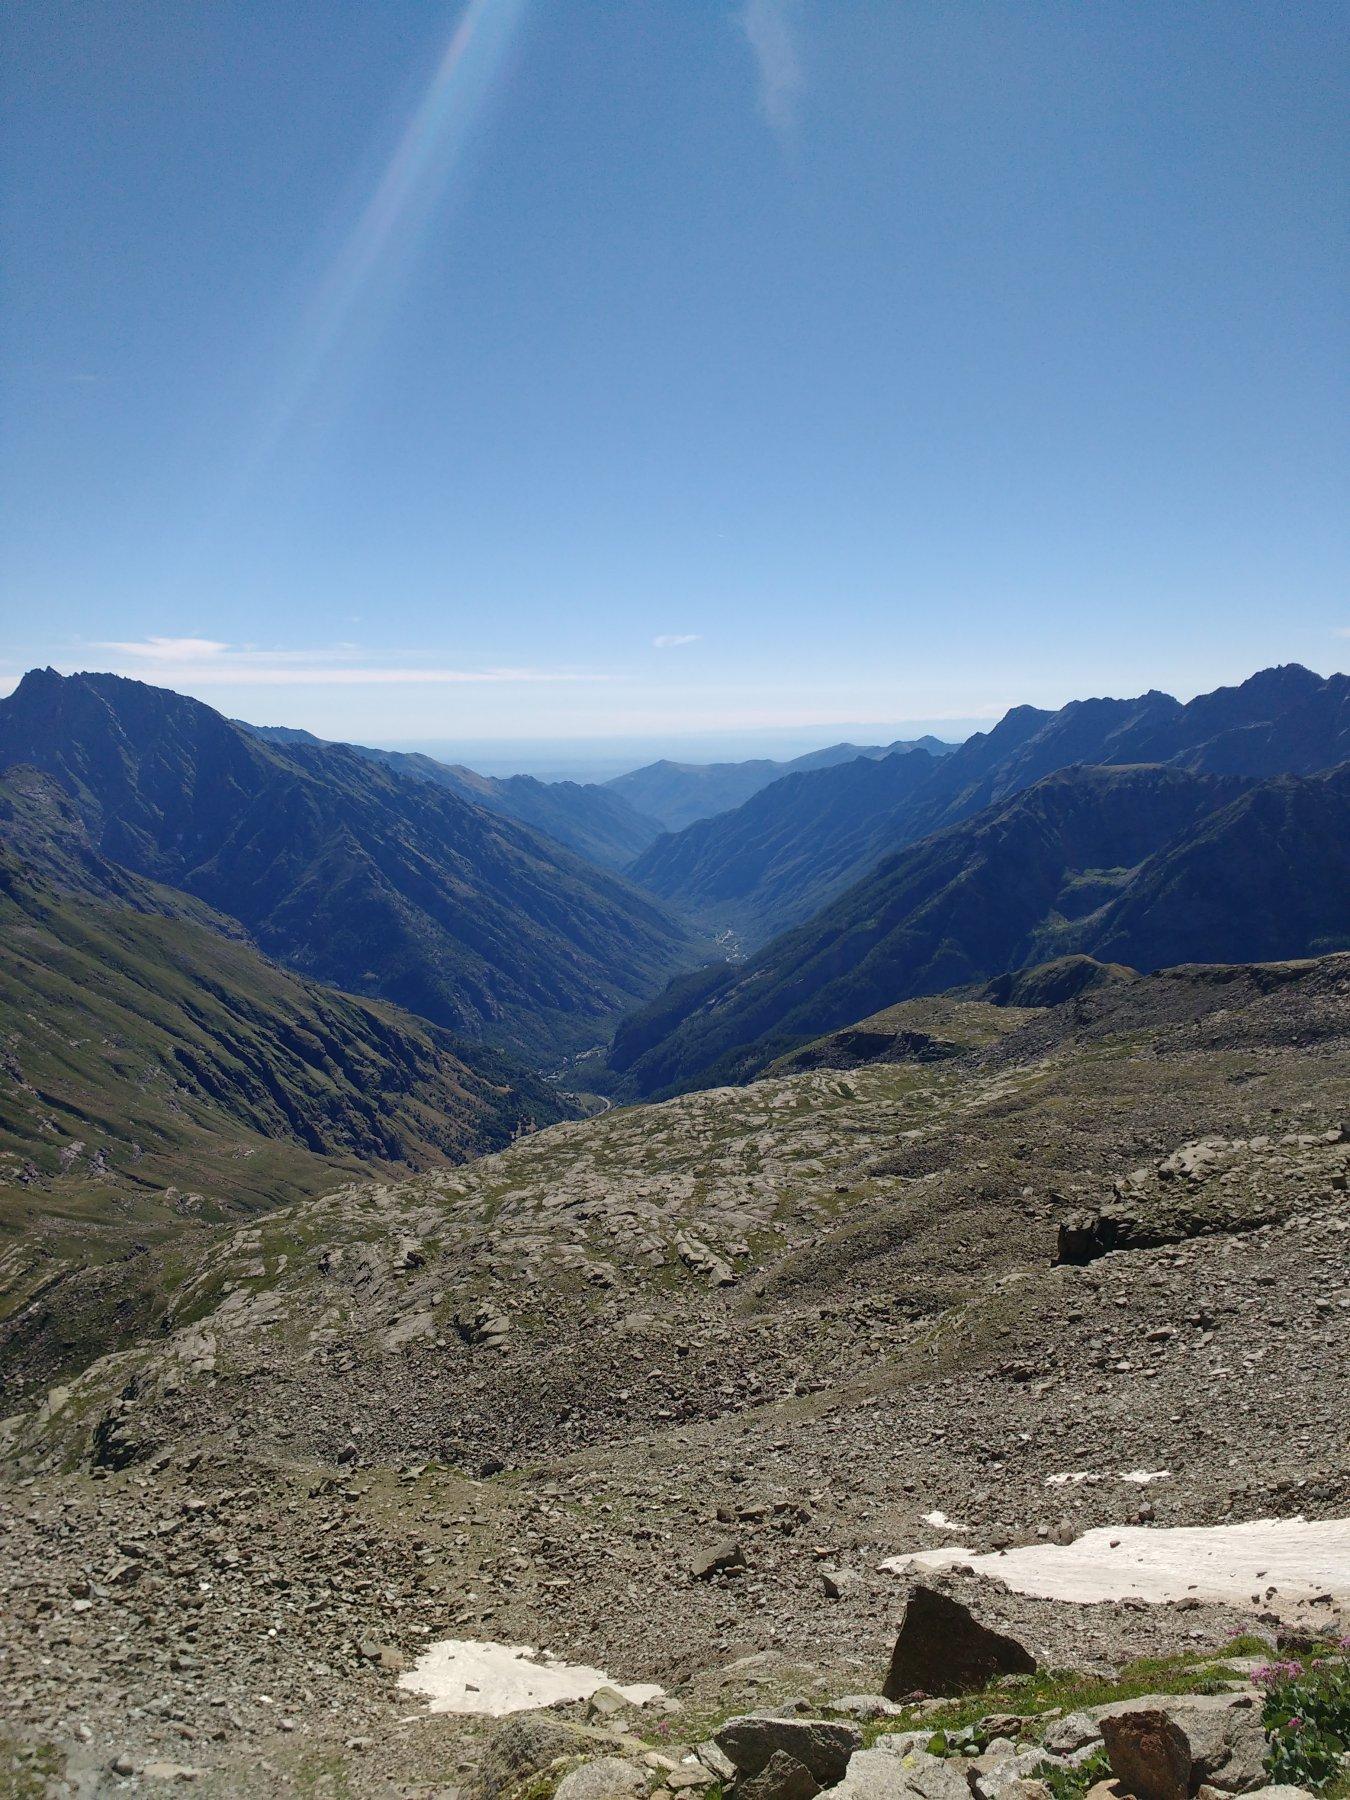 Valle Orco e pianura in lontananza